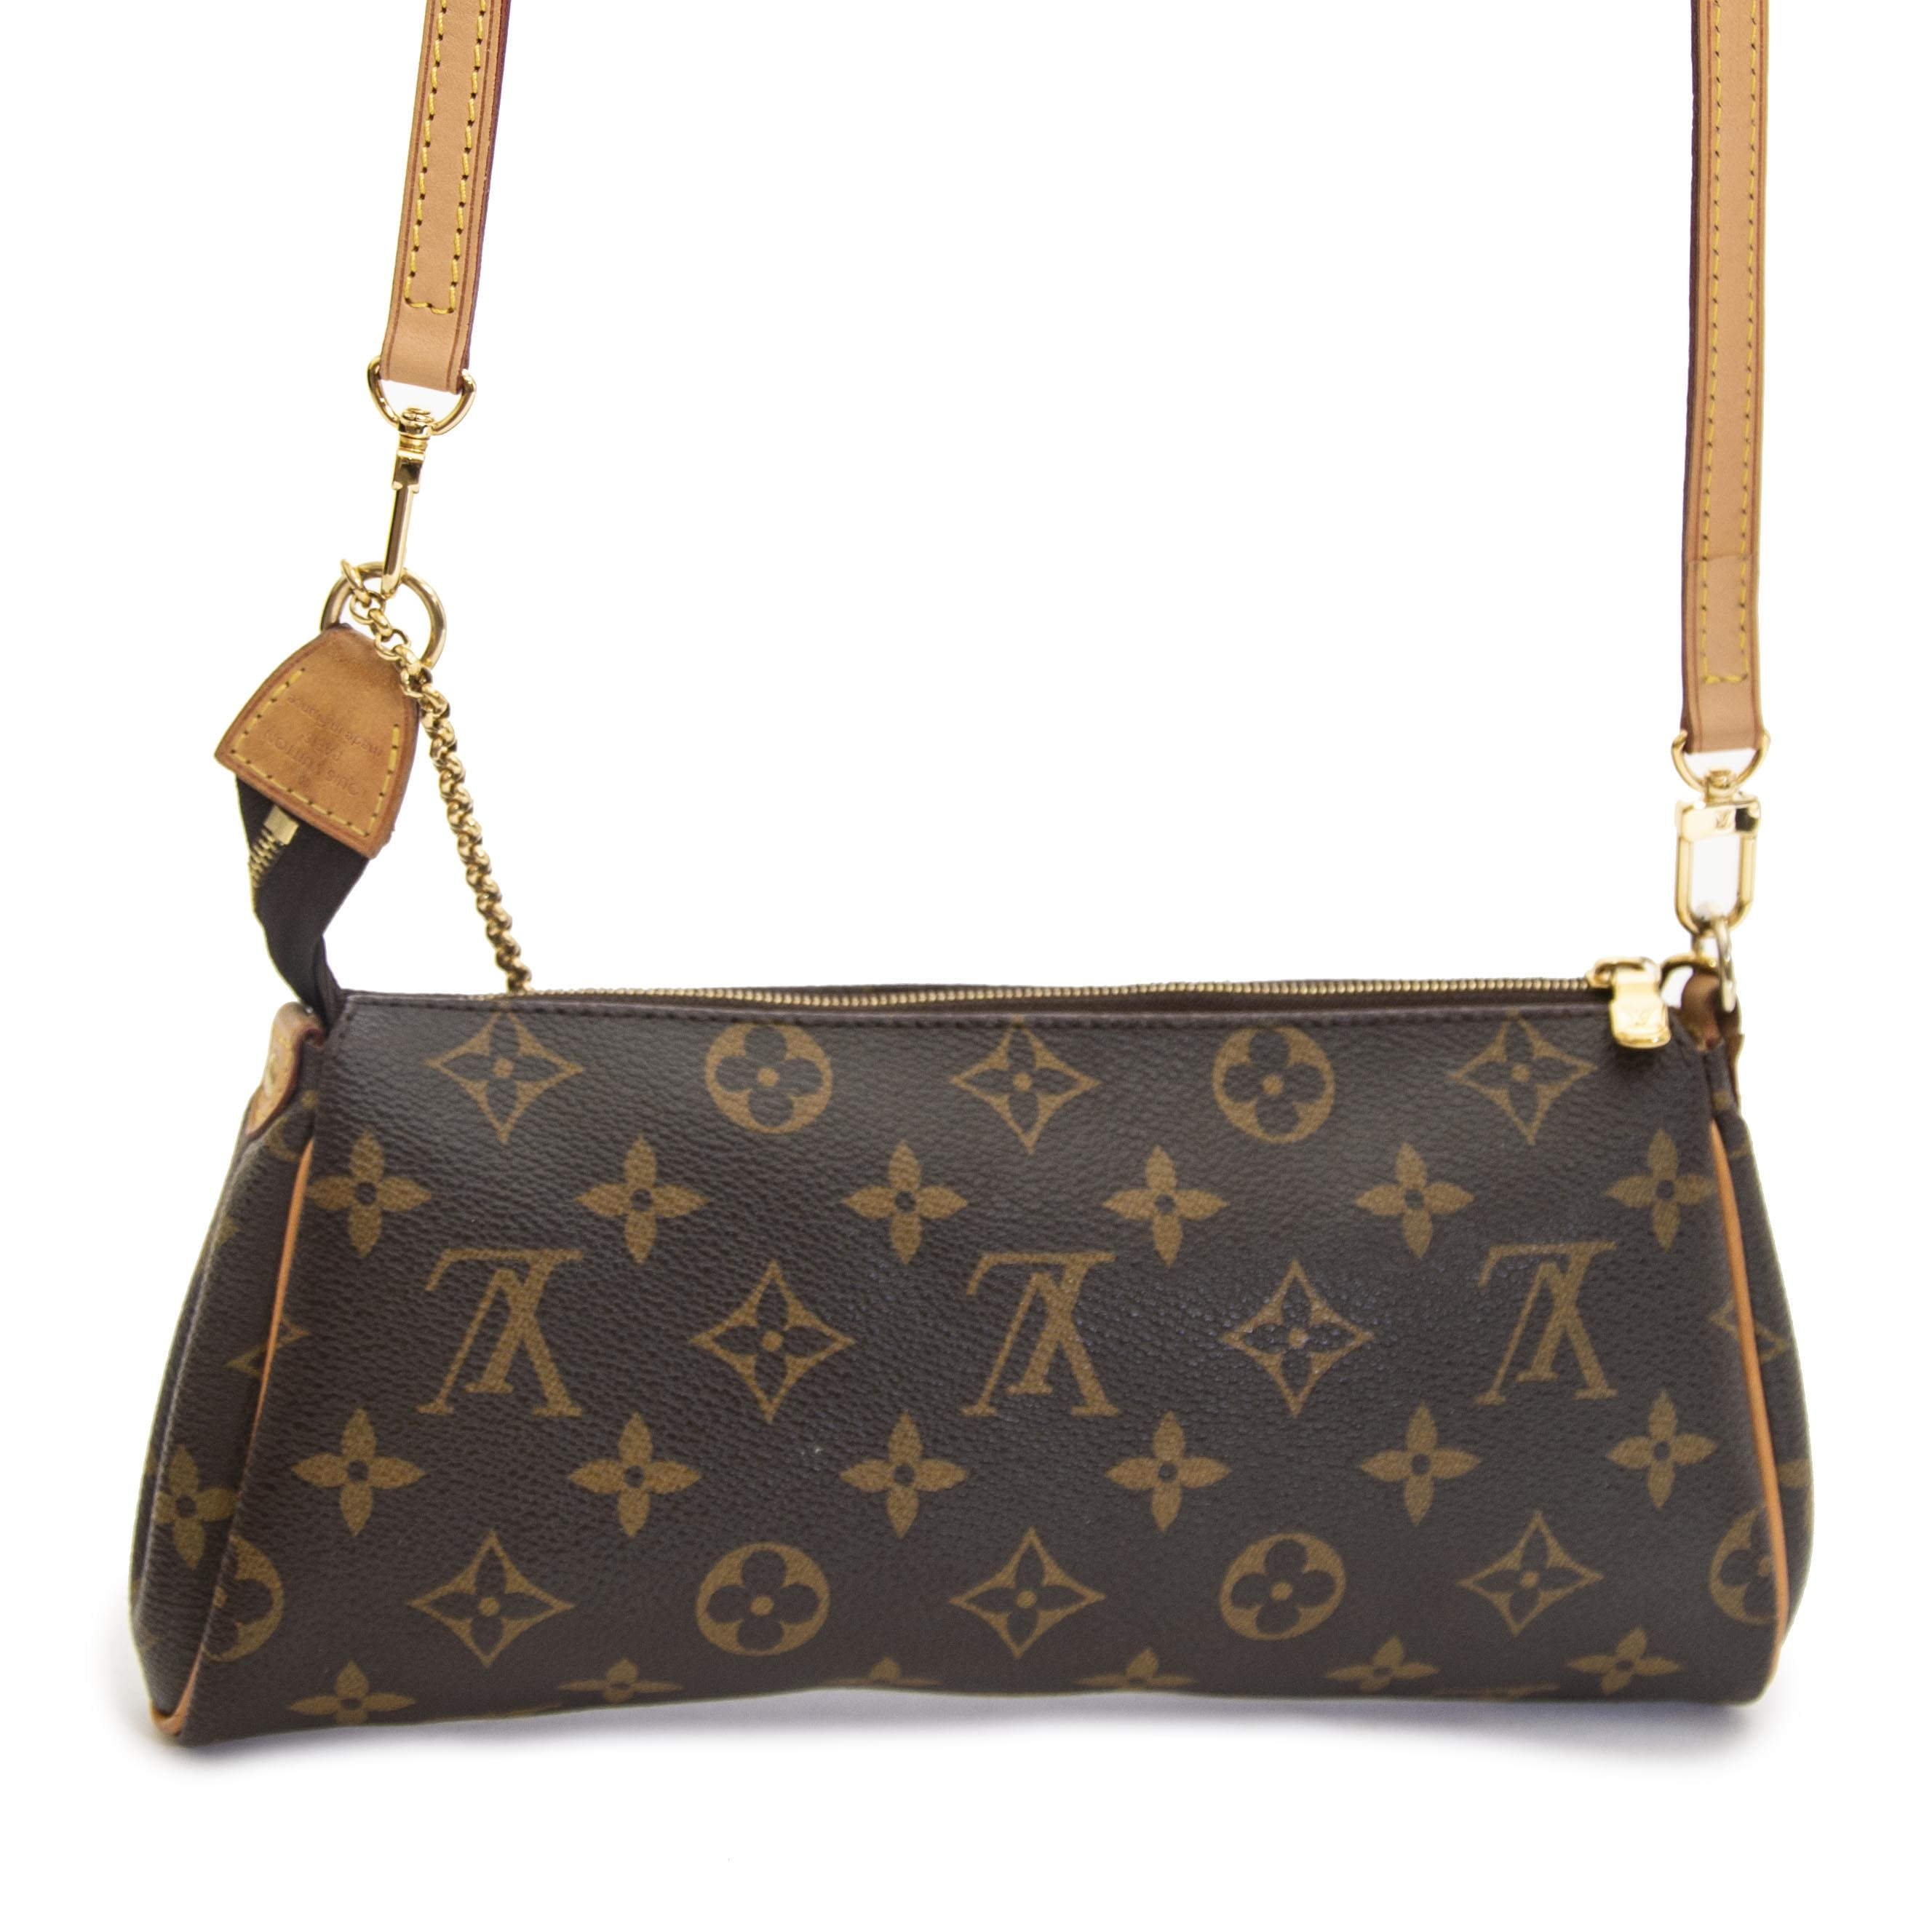 ee46f095af5 ... Louis Vuitton Monogram Eva Crossbody Bag now for sale at labellov  vintage fashion webshop belgium